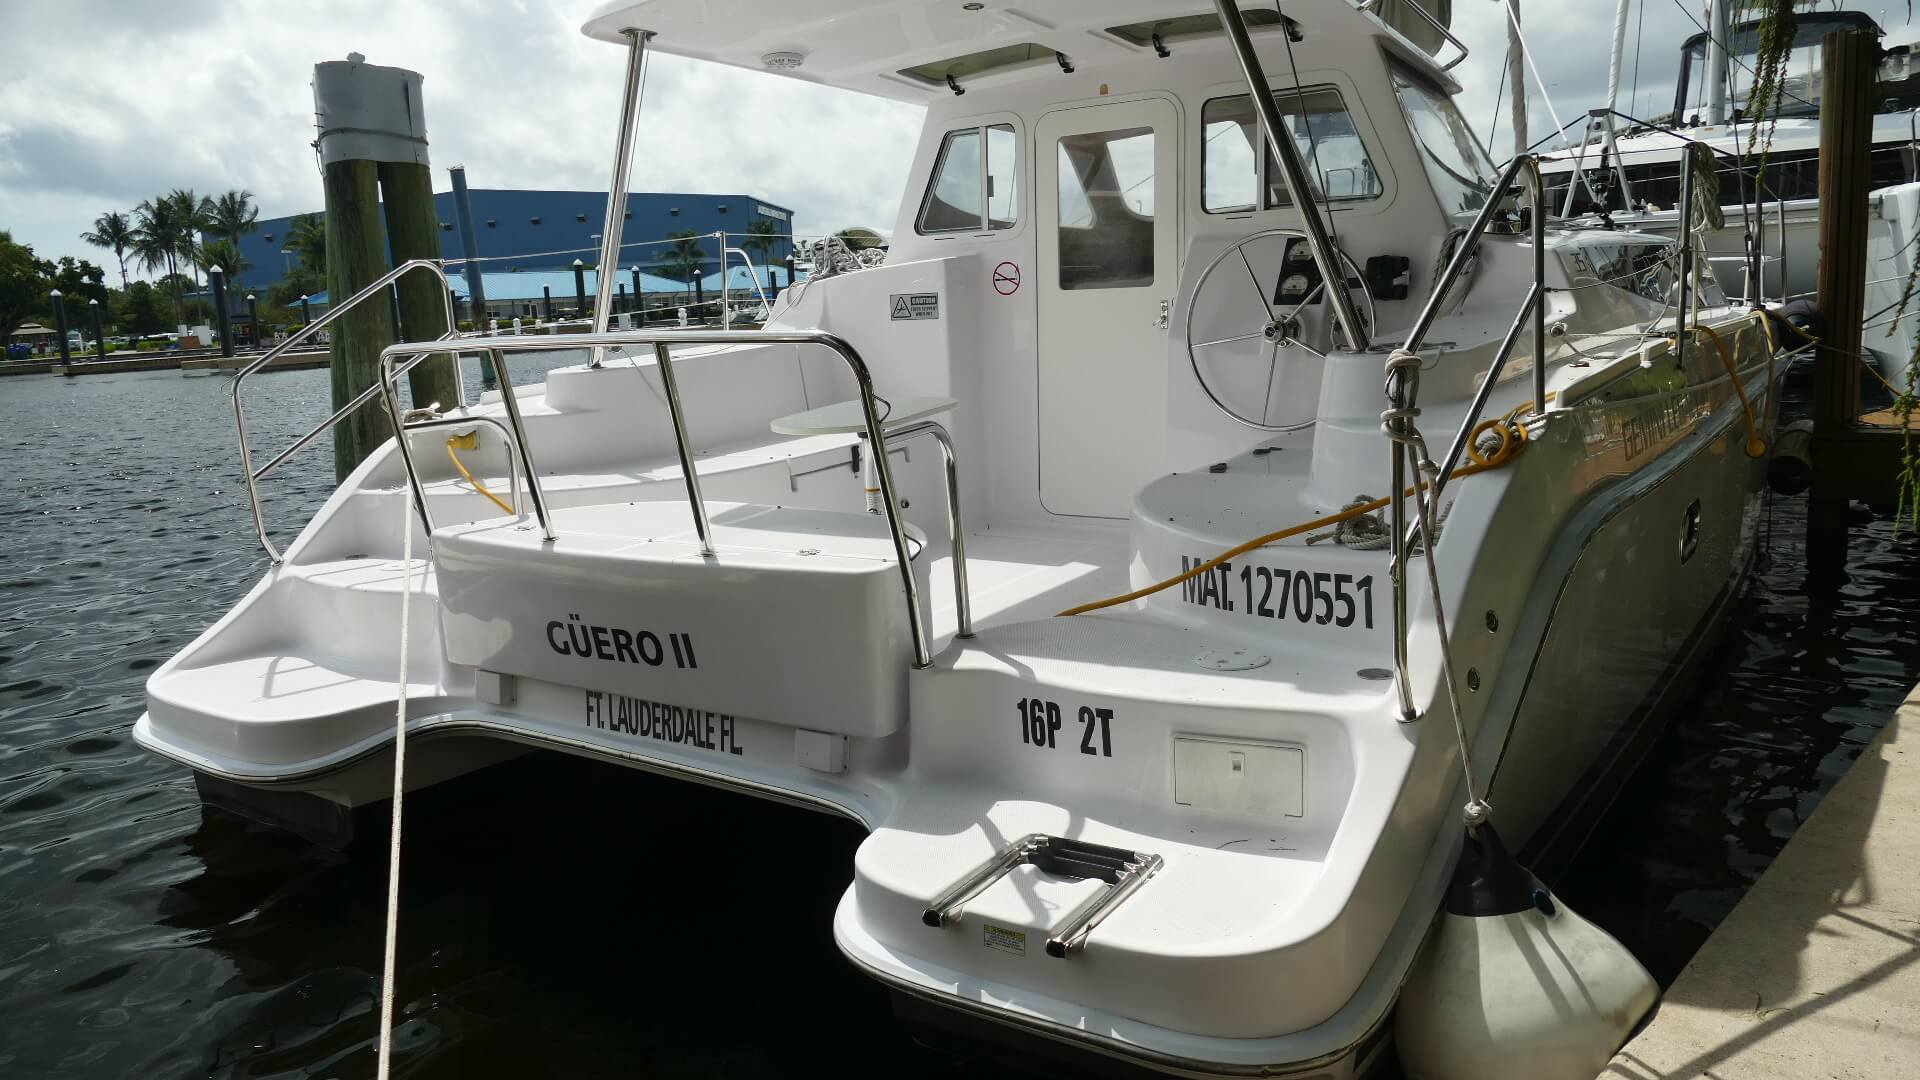 Catamarans GUERO II, Manufacturer: GEMINI CATAMARANS, Model Year: 2016, Length: 35ft, Model: Legacy 35, Condition: New, Listing Status: Coming Soon, Price: USD 245000